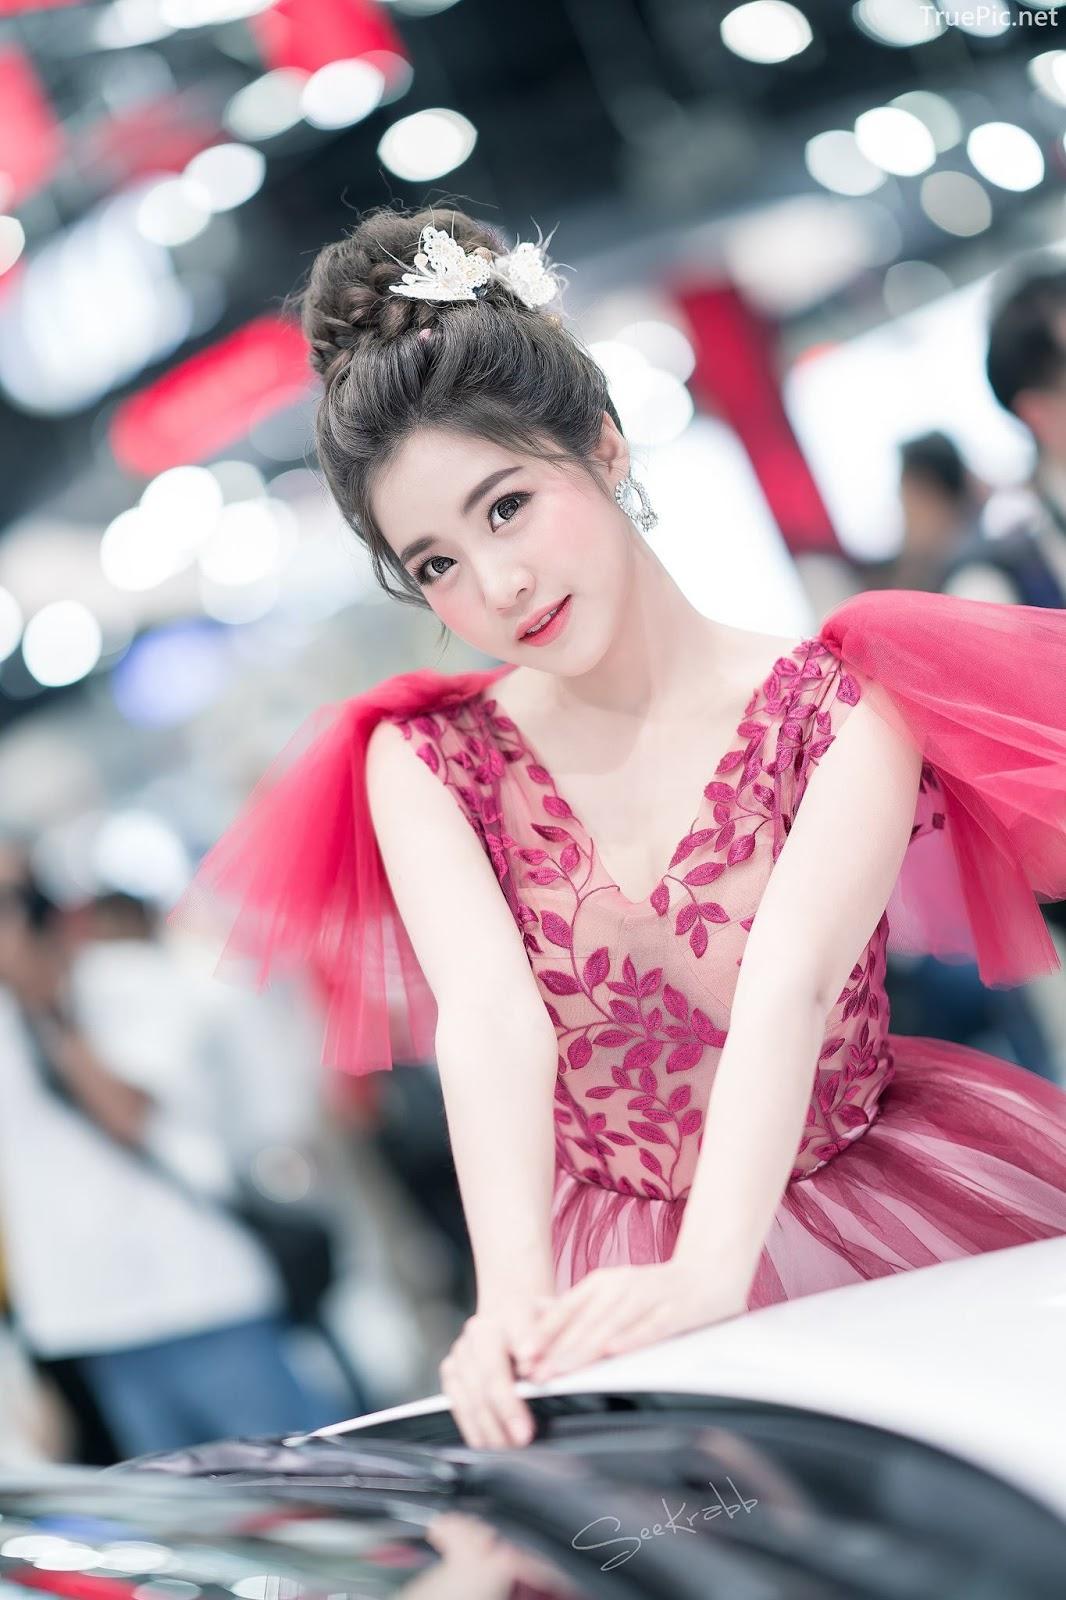 Thailand Racing Model - Fah Chatchaya Suthisuwan - Thailand International Motor Expo